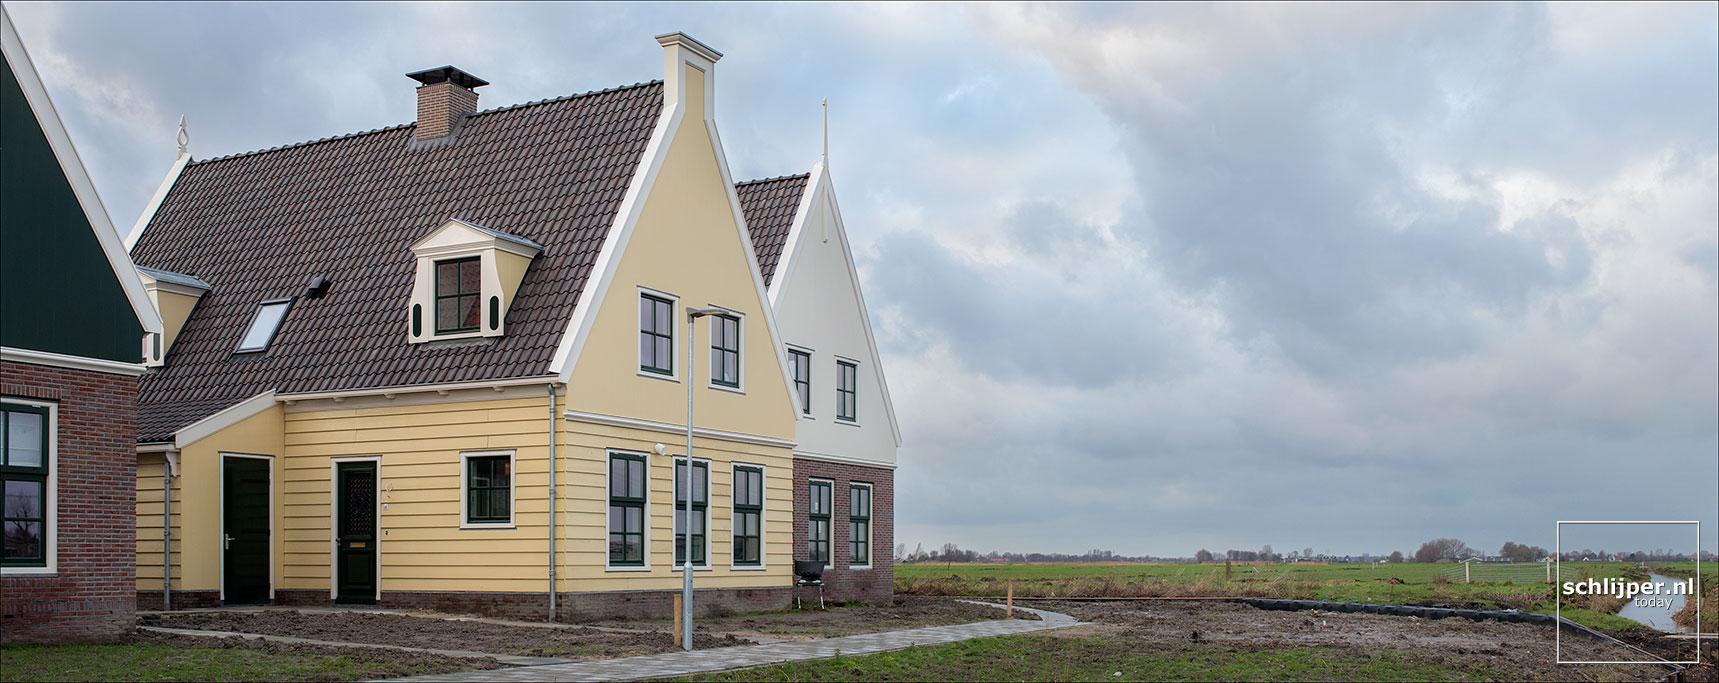 Nederland, Het Nopeind, 28 december 2017